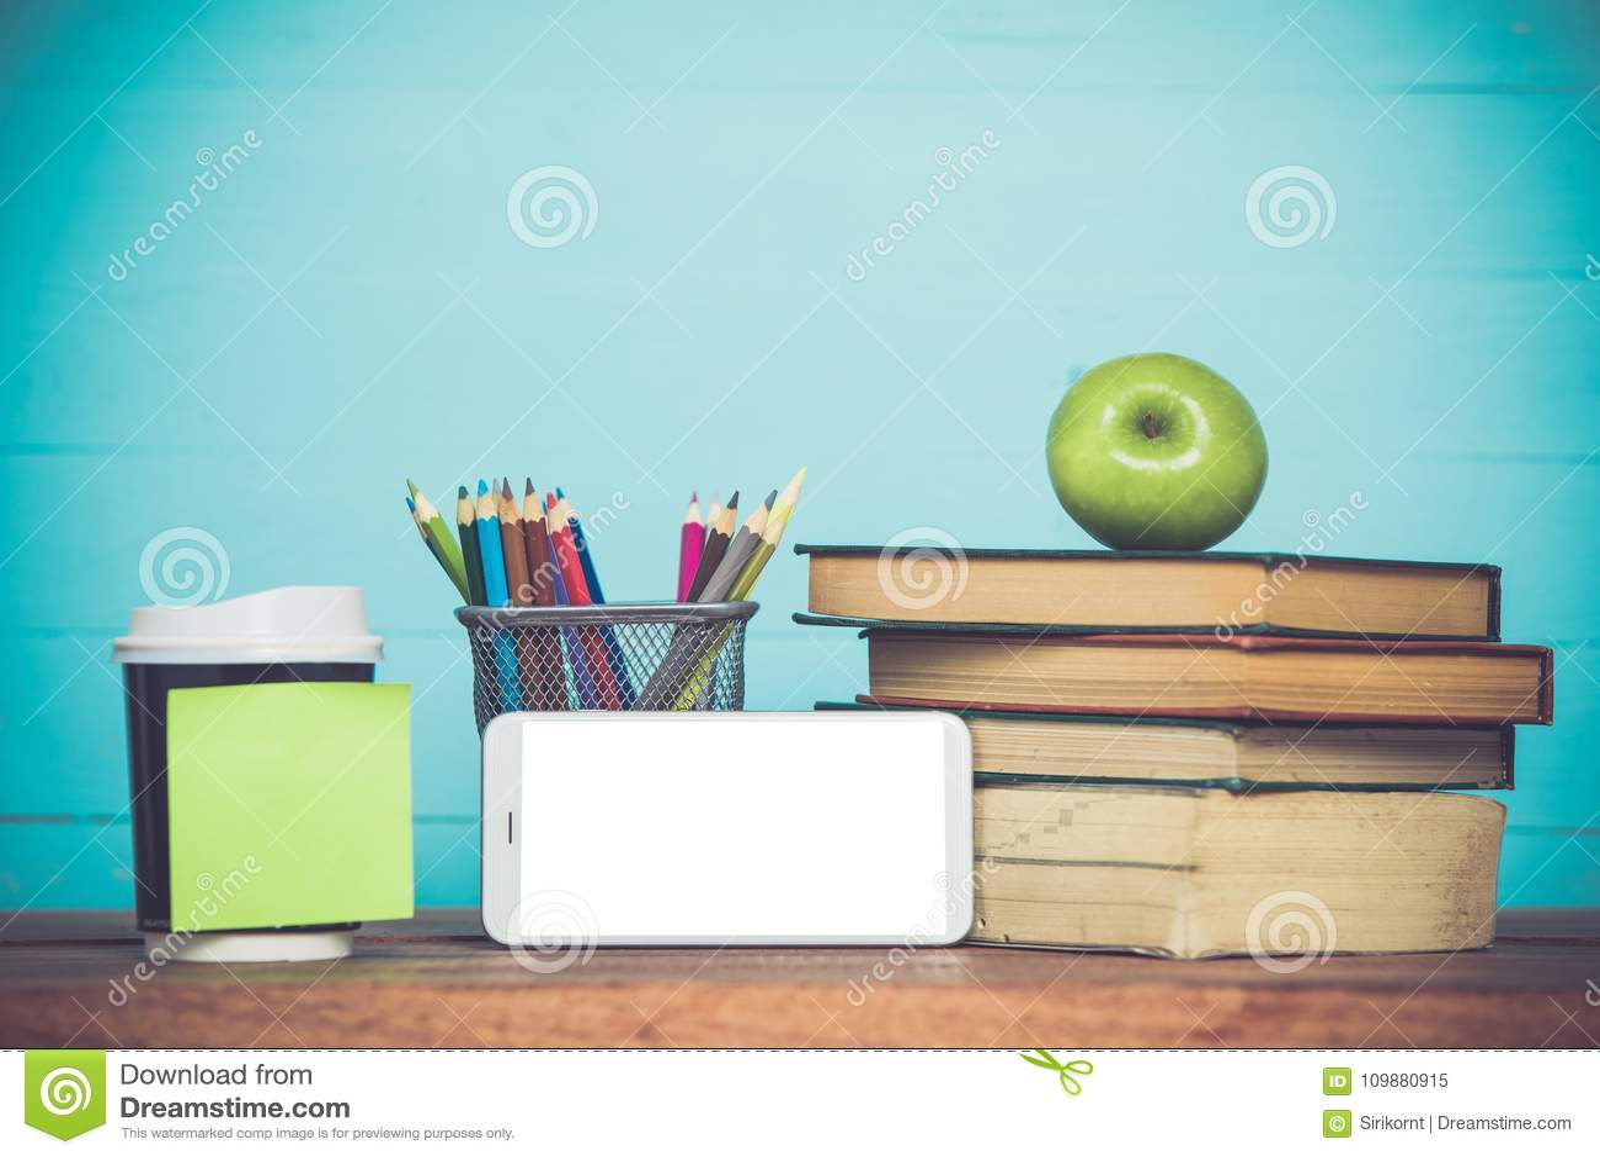 Apple imac & home office workspace free psd mockup firmbee.